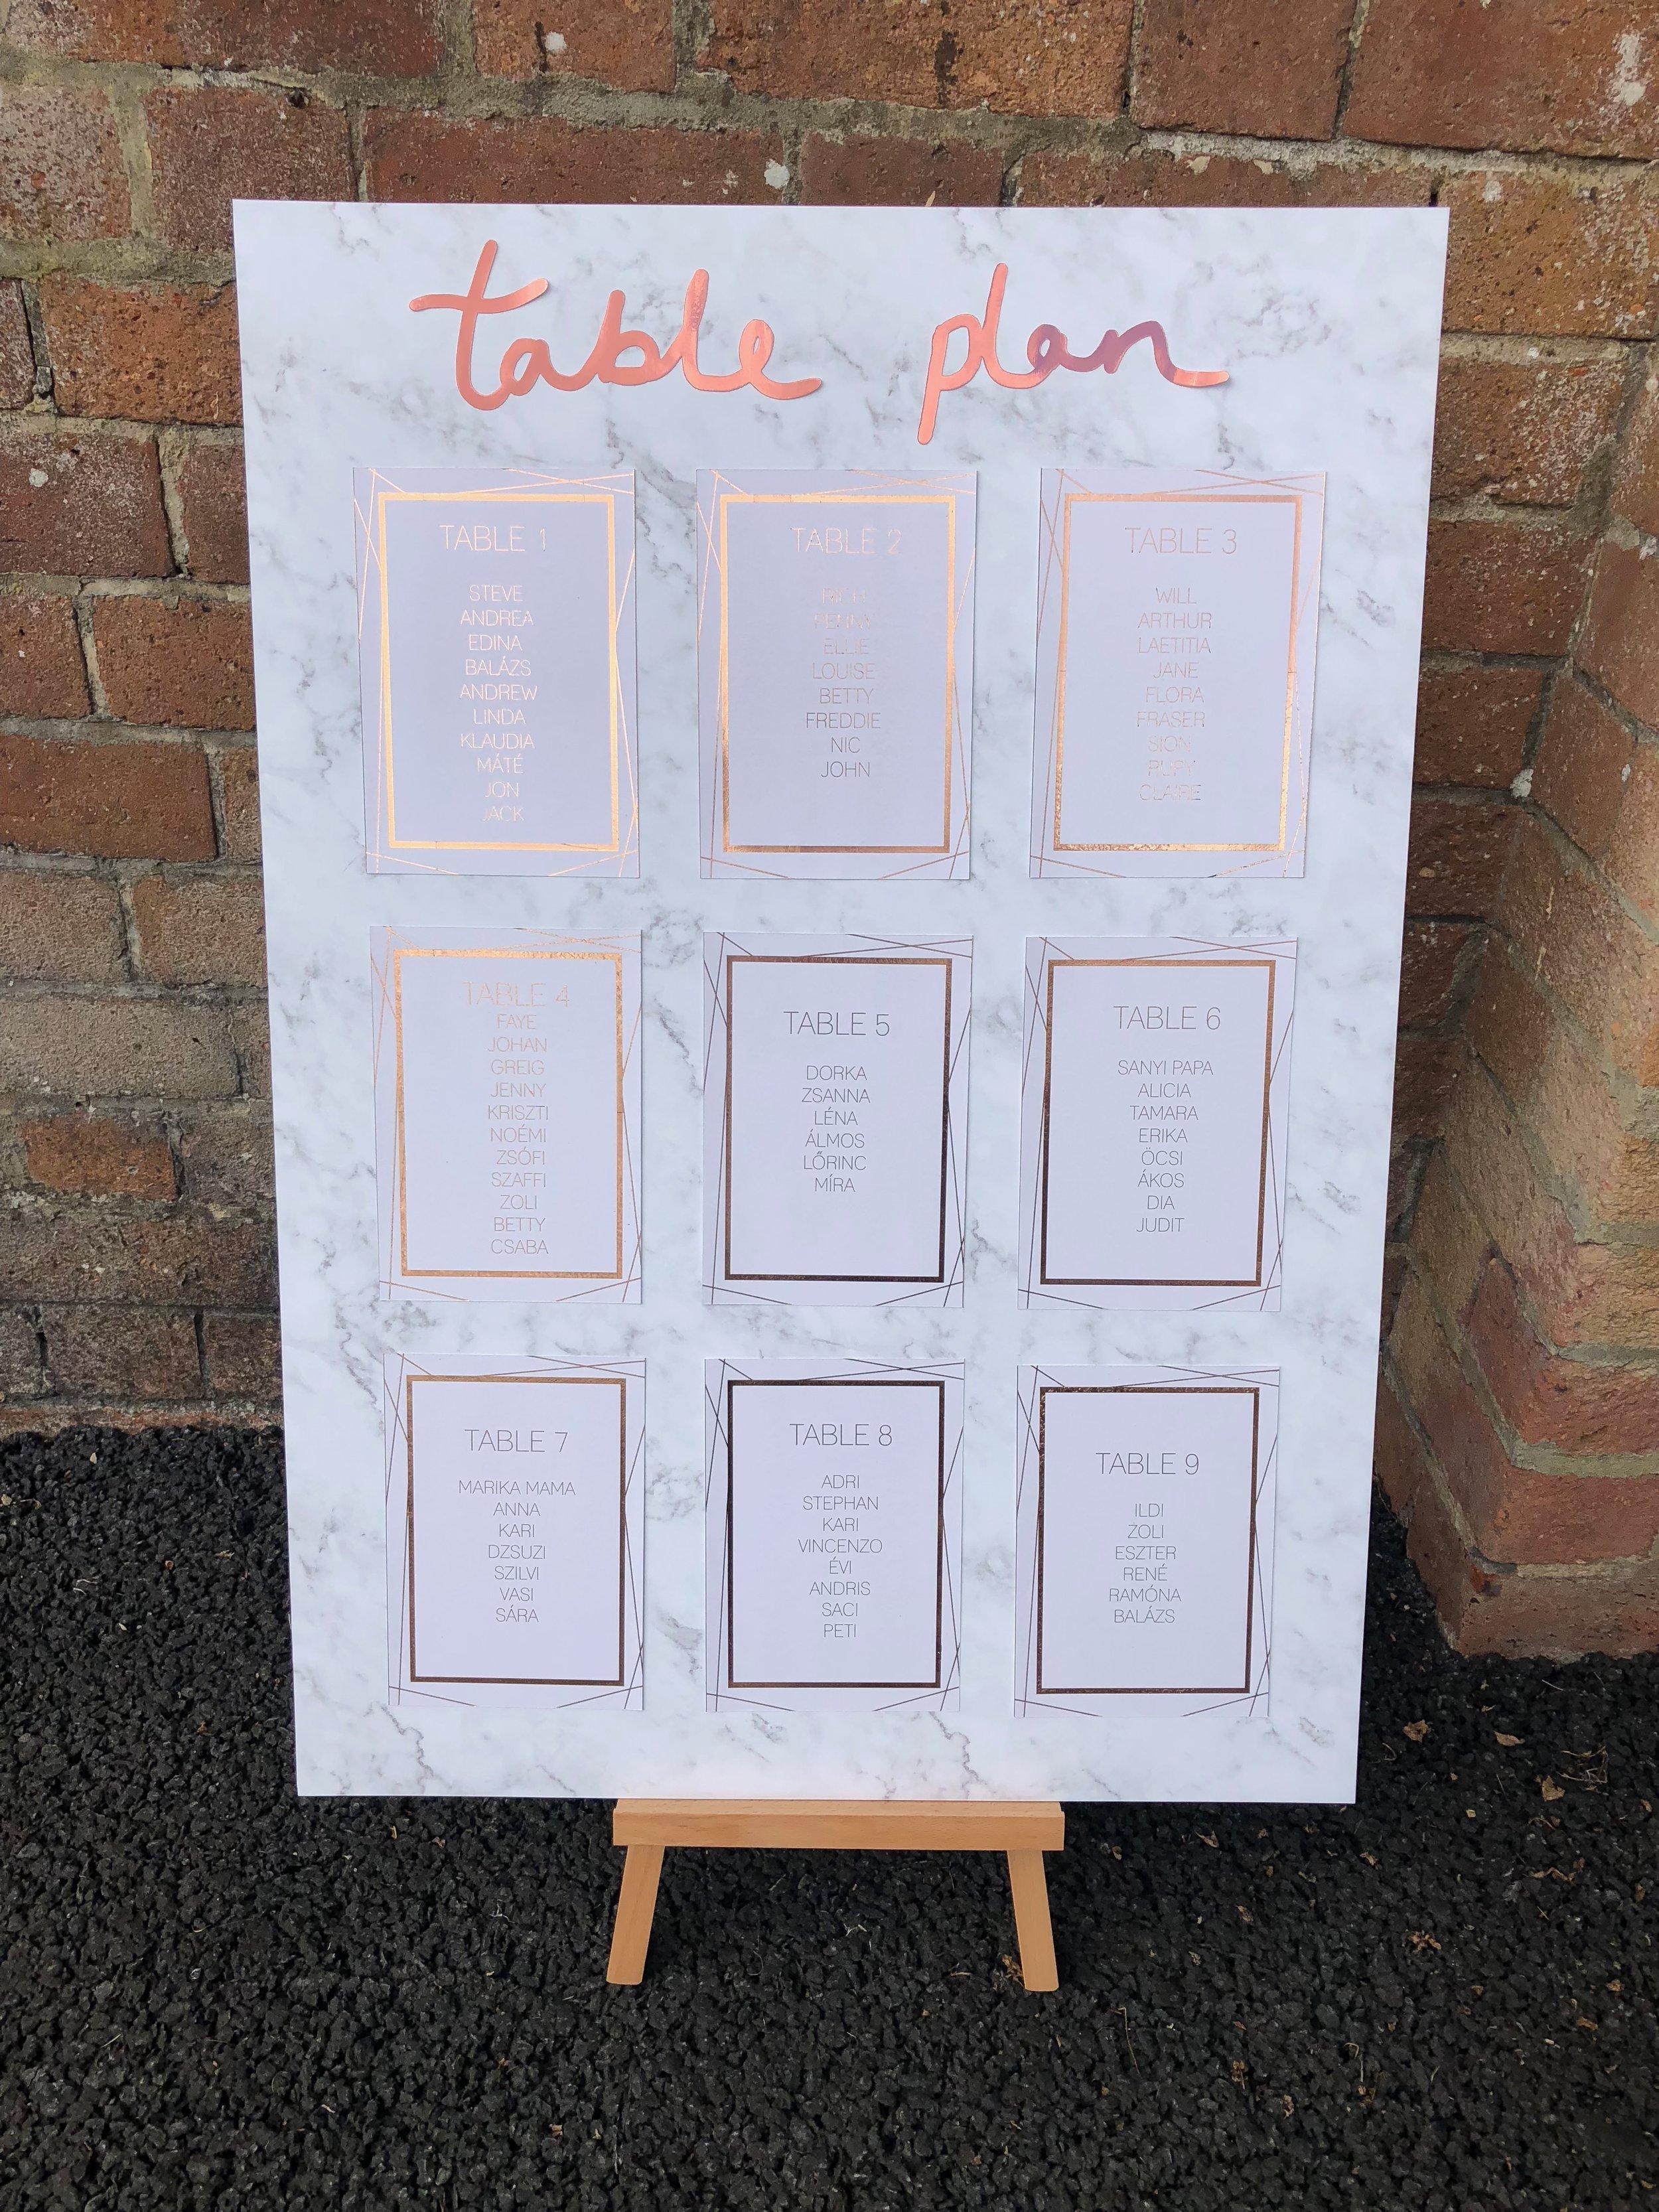 Table plan ideas